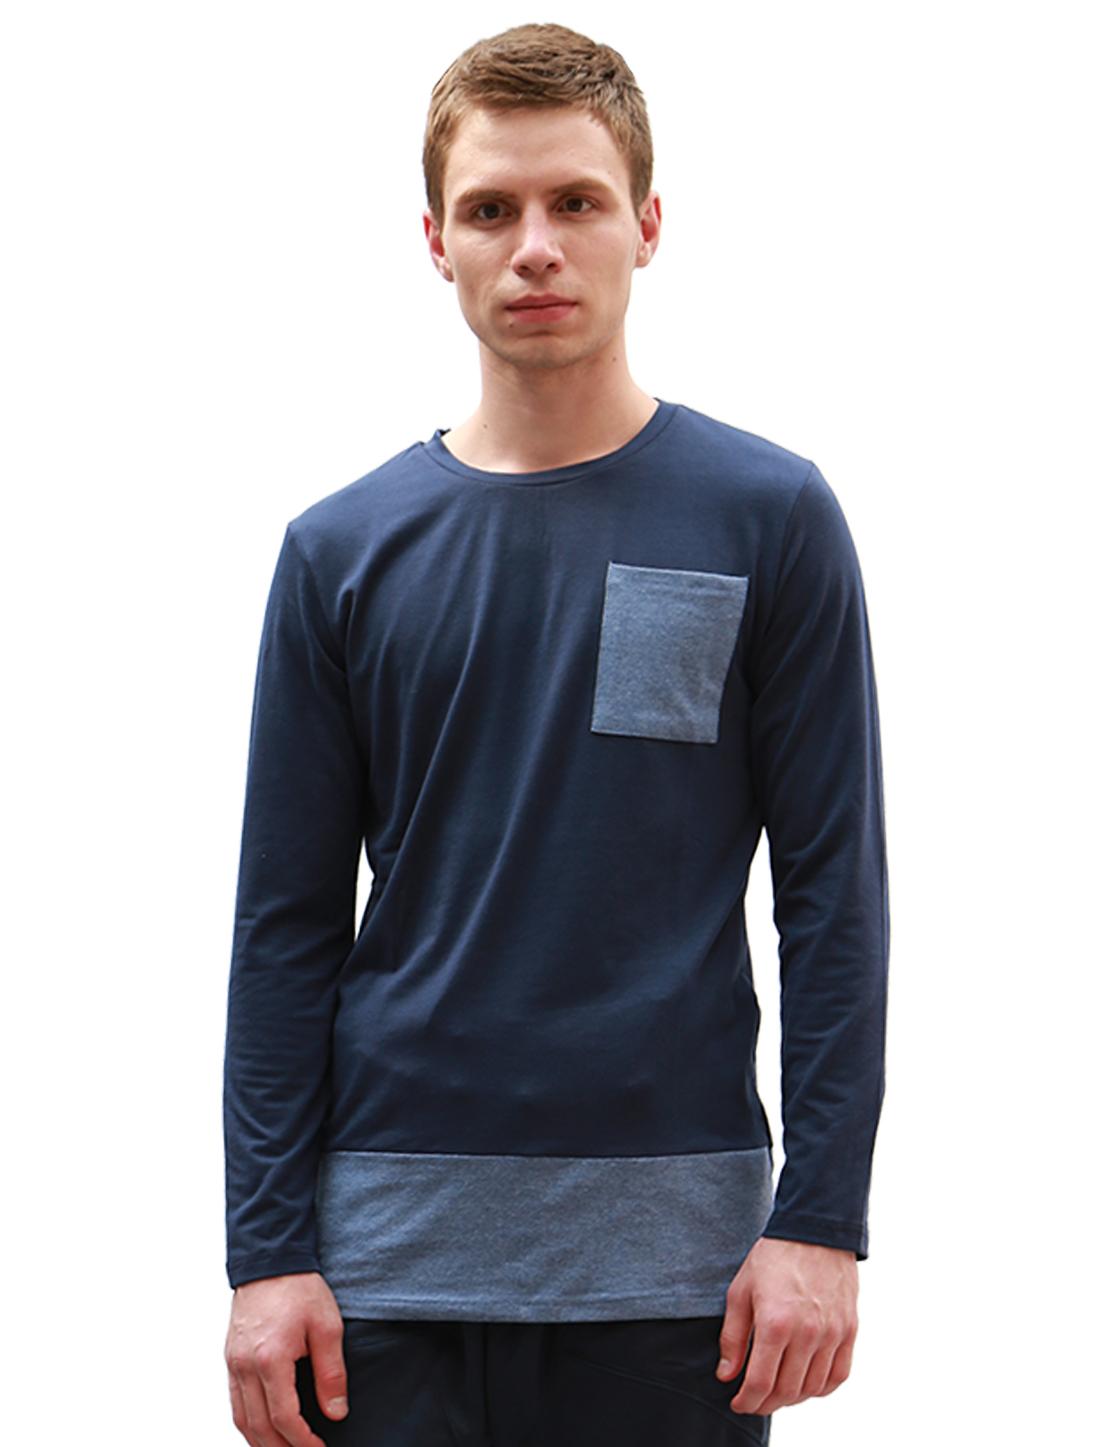 Men Contrast Color LonglineChest Pocket Leisure Tee Shirt Navy Blue L